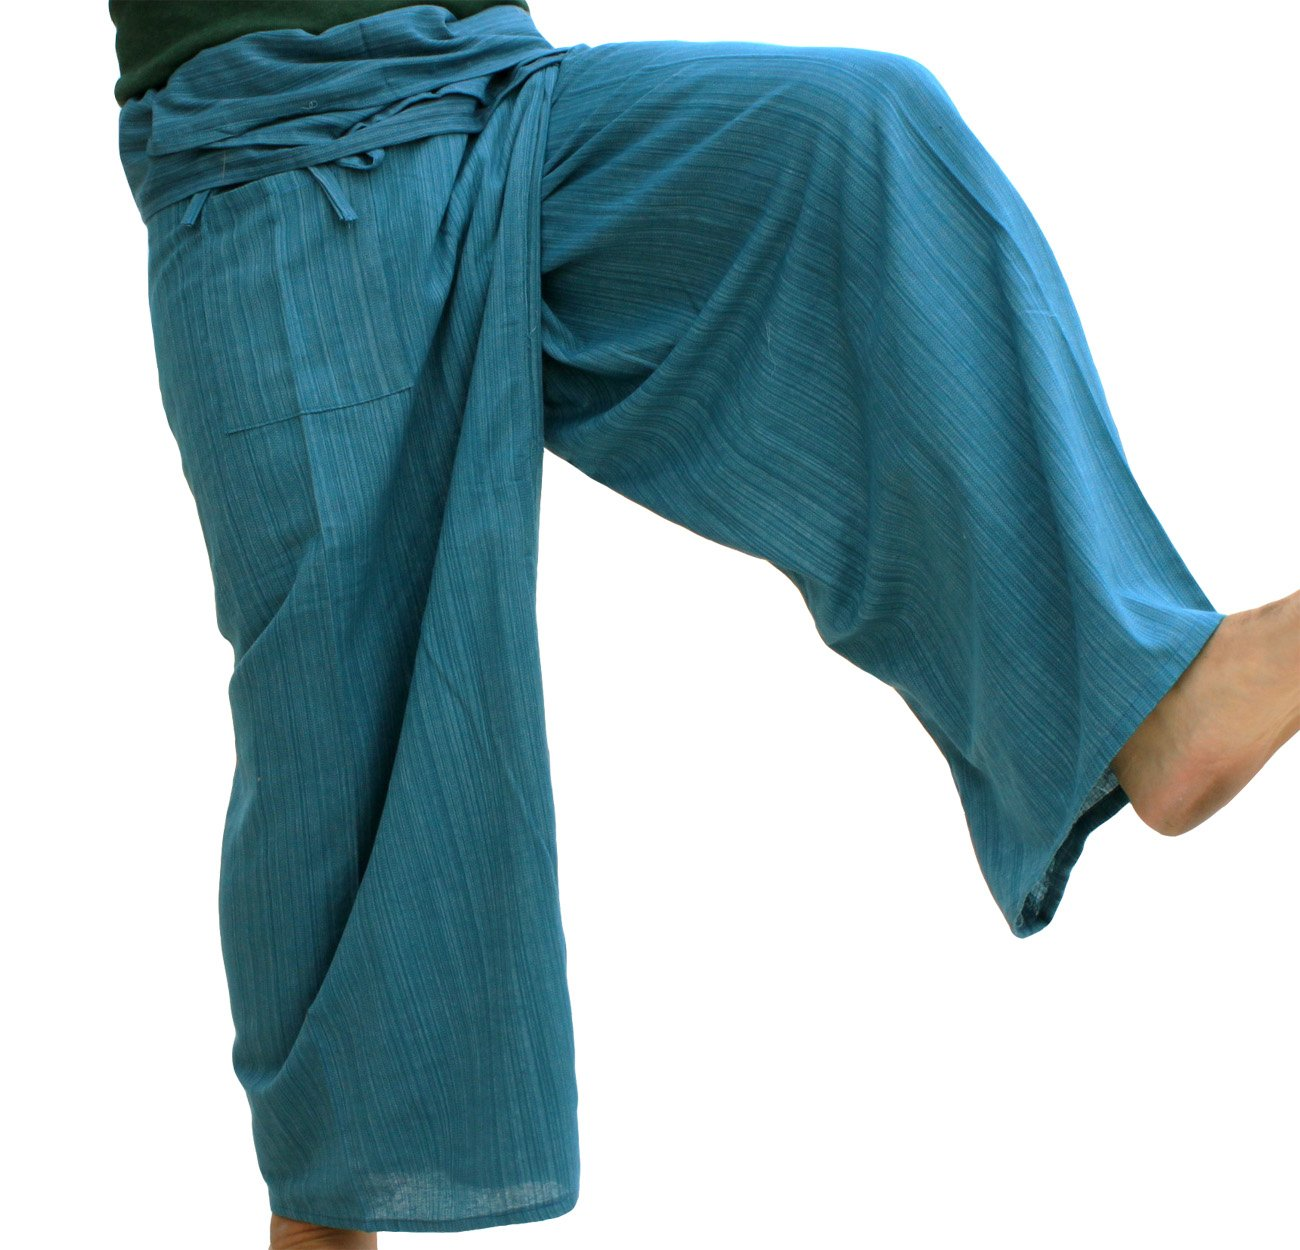 RaanPahMuang Light Striped Cotton Tall Thai Fisherman Wrap Pants Plus, XX-Large, Green by RaanPahMuang